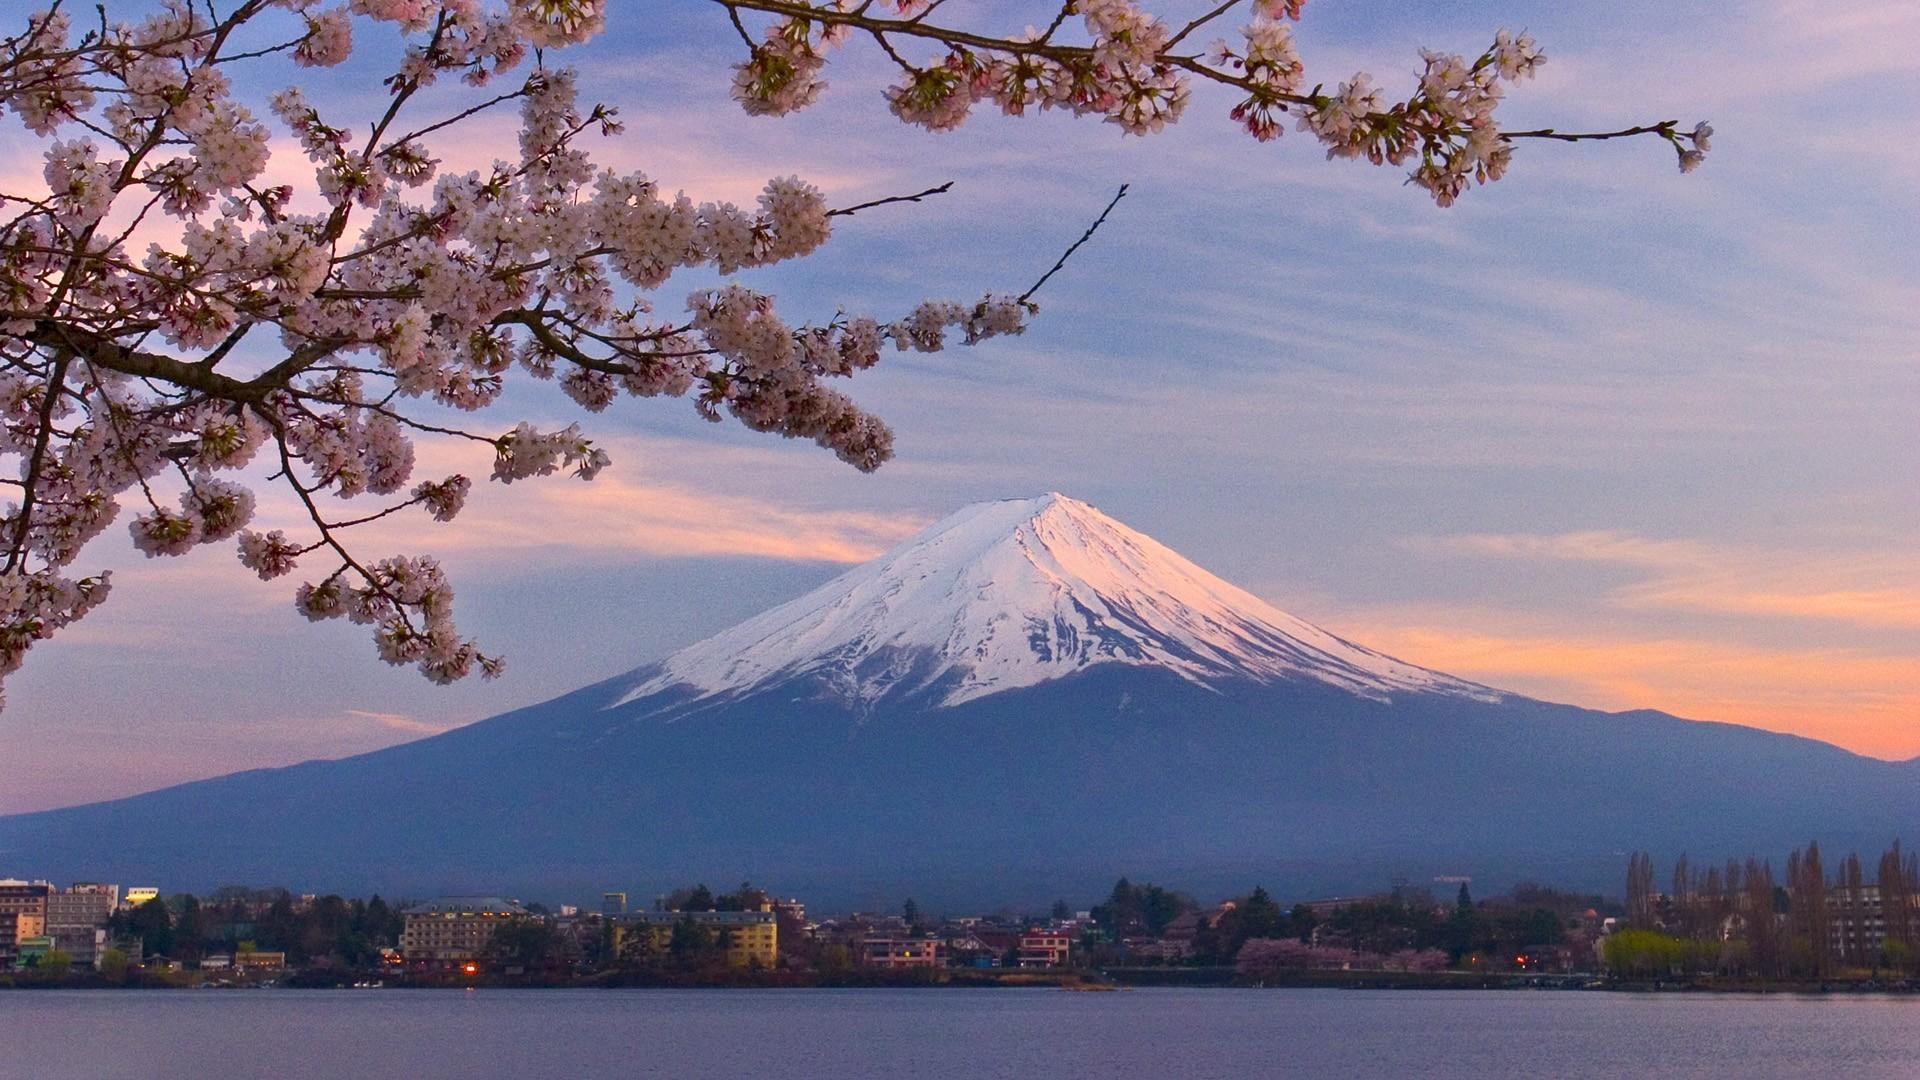 Mount Fuji Cherry Blossom Wallpaper